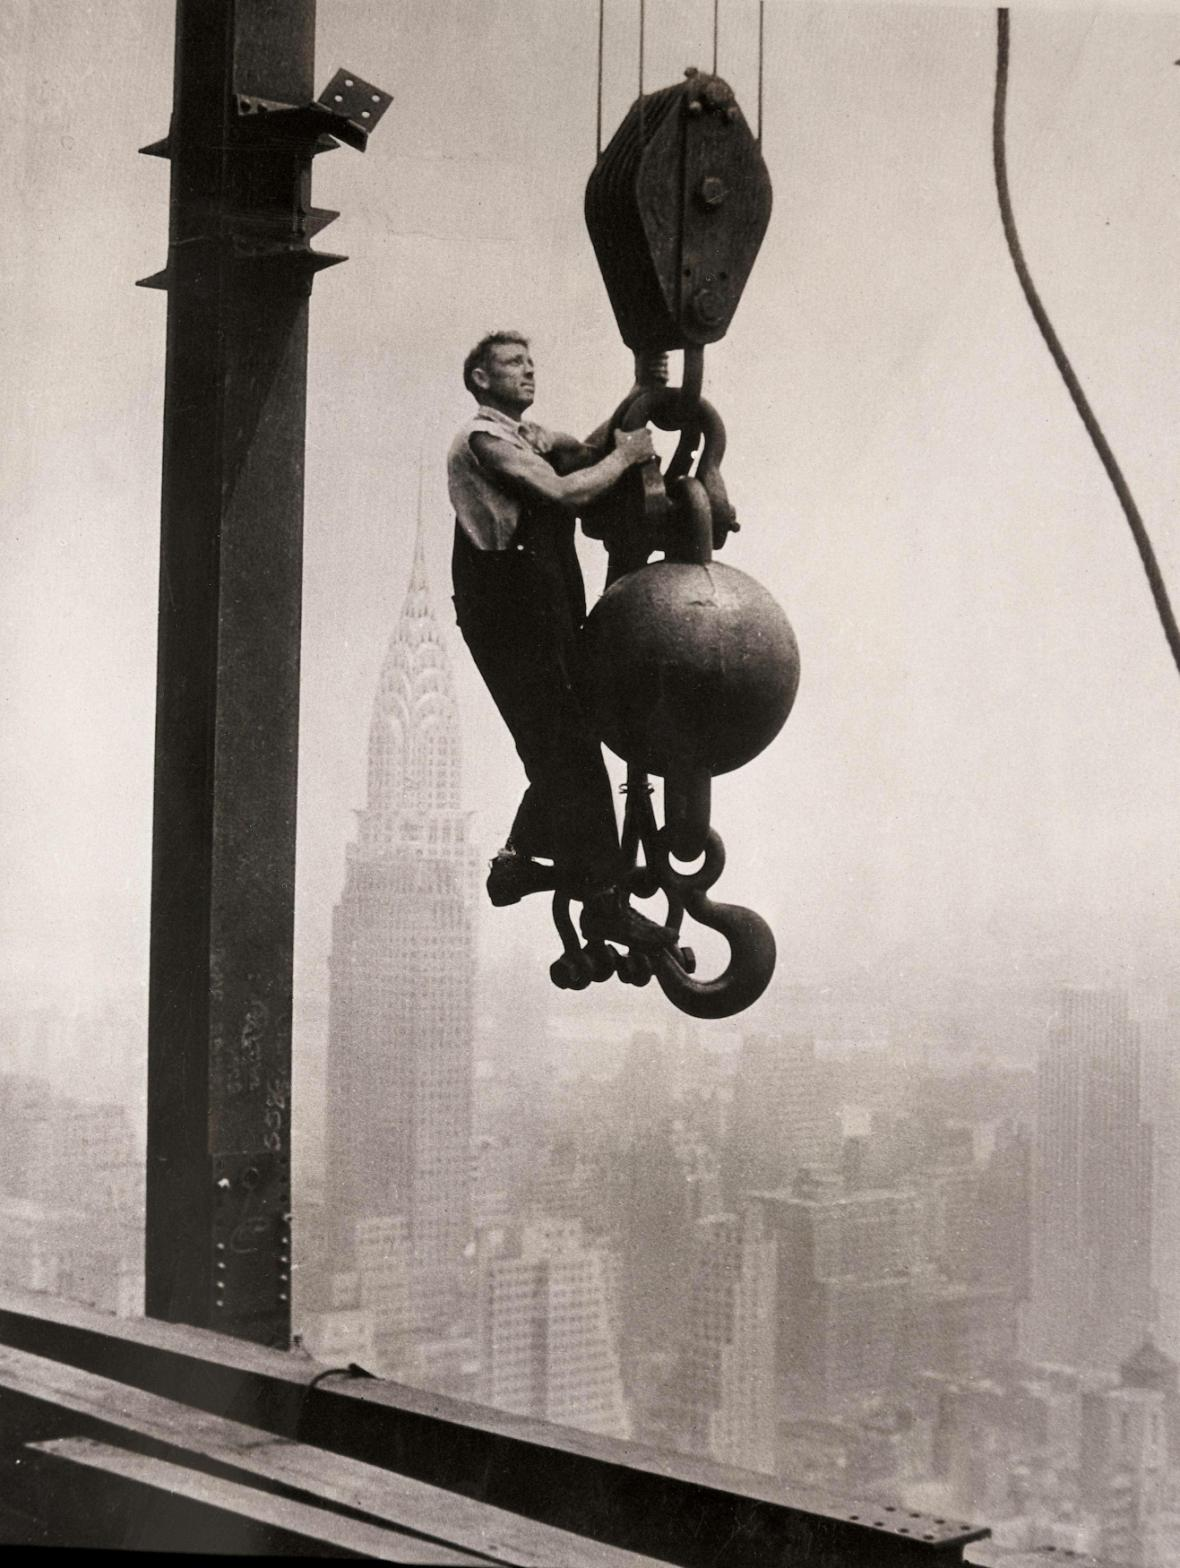 Stavbař během práce na mrakodrapu